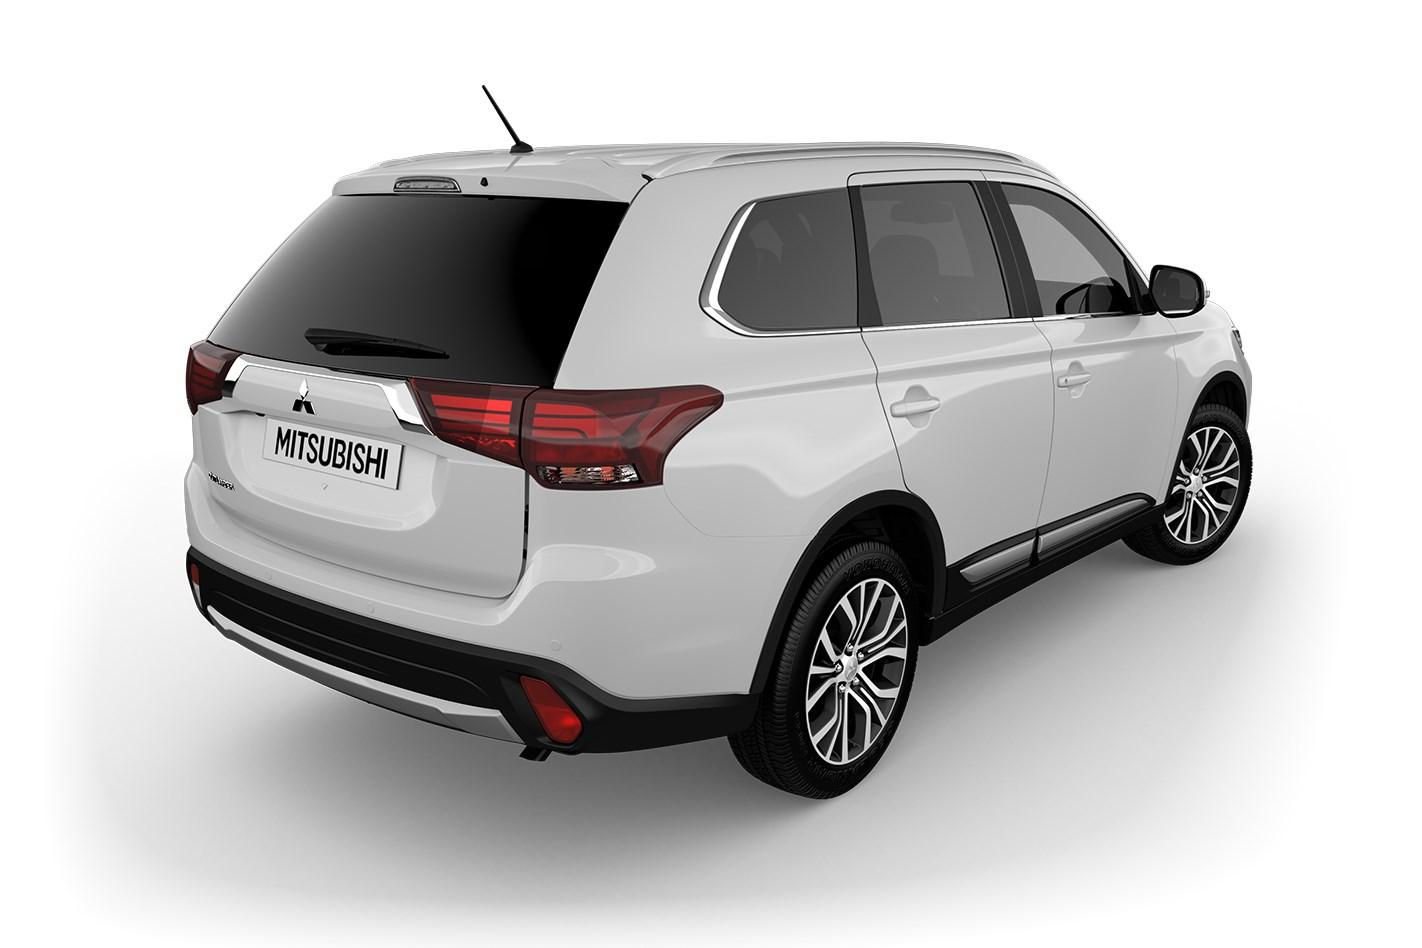 2016 Mitsubishi Outlander Ls 4x2 20l 4cyl Petrol Manual Suv Schematic